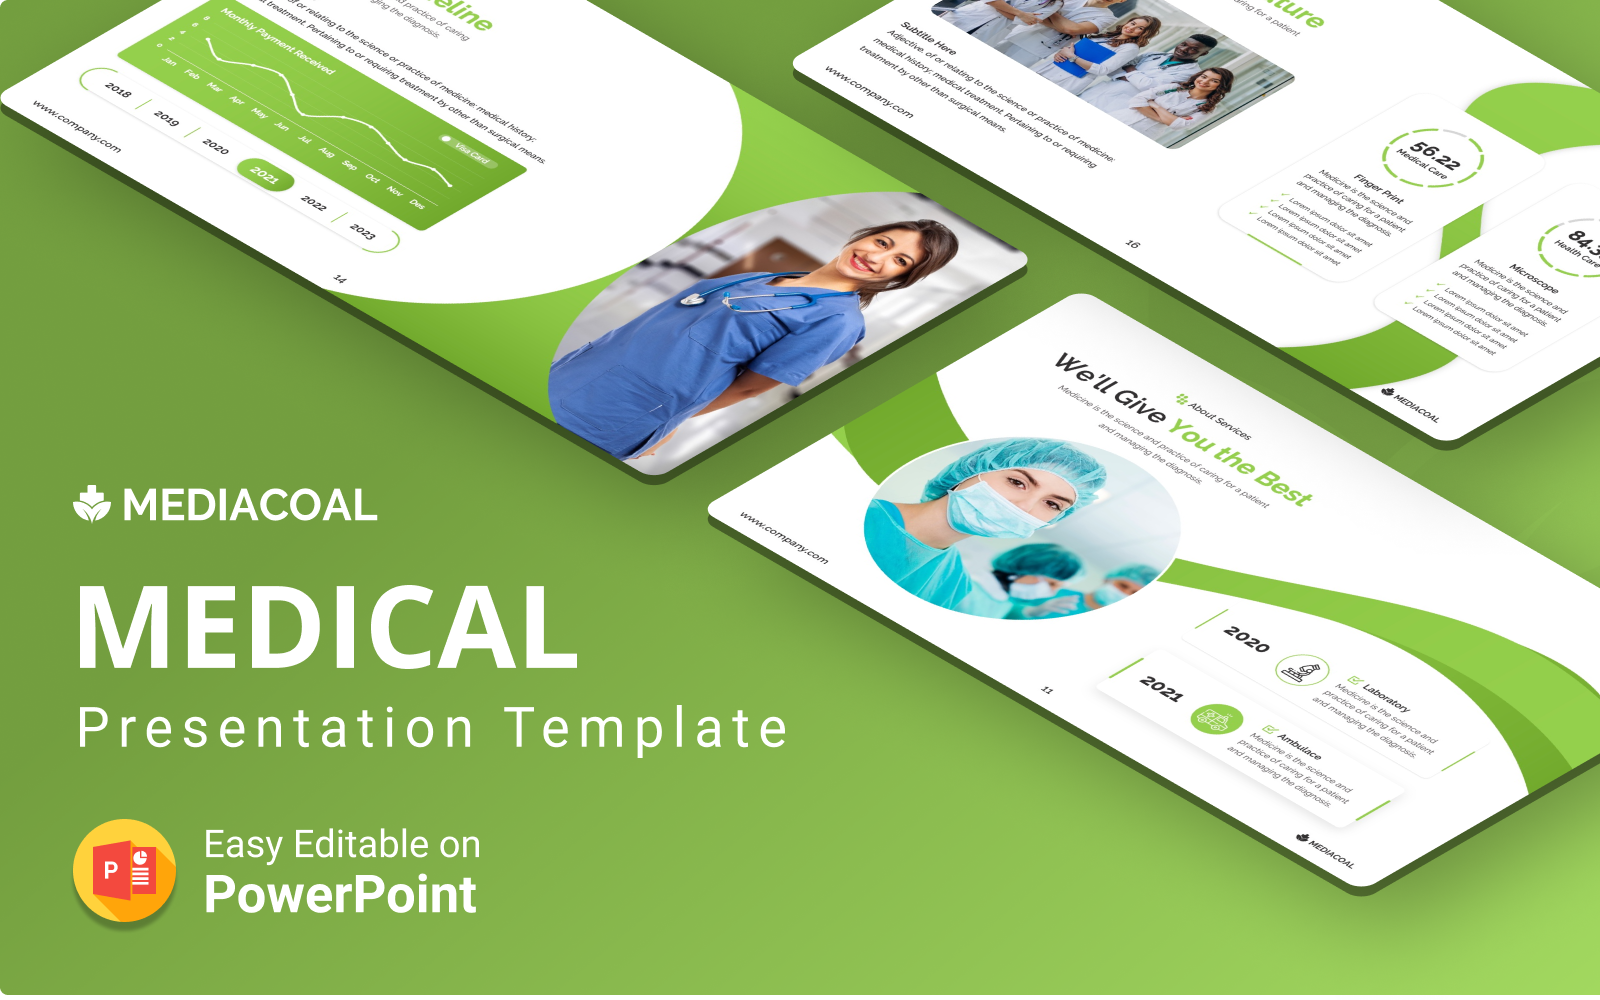 Mediacoal – Medical PowerPoint Presentation Template